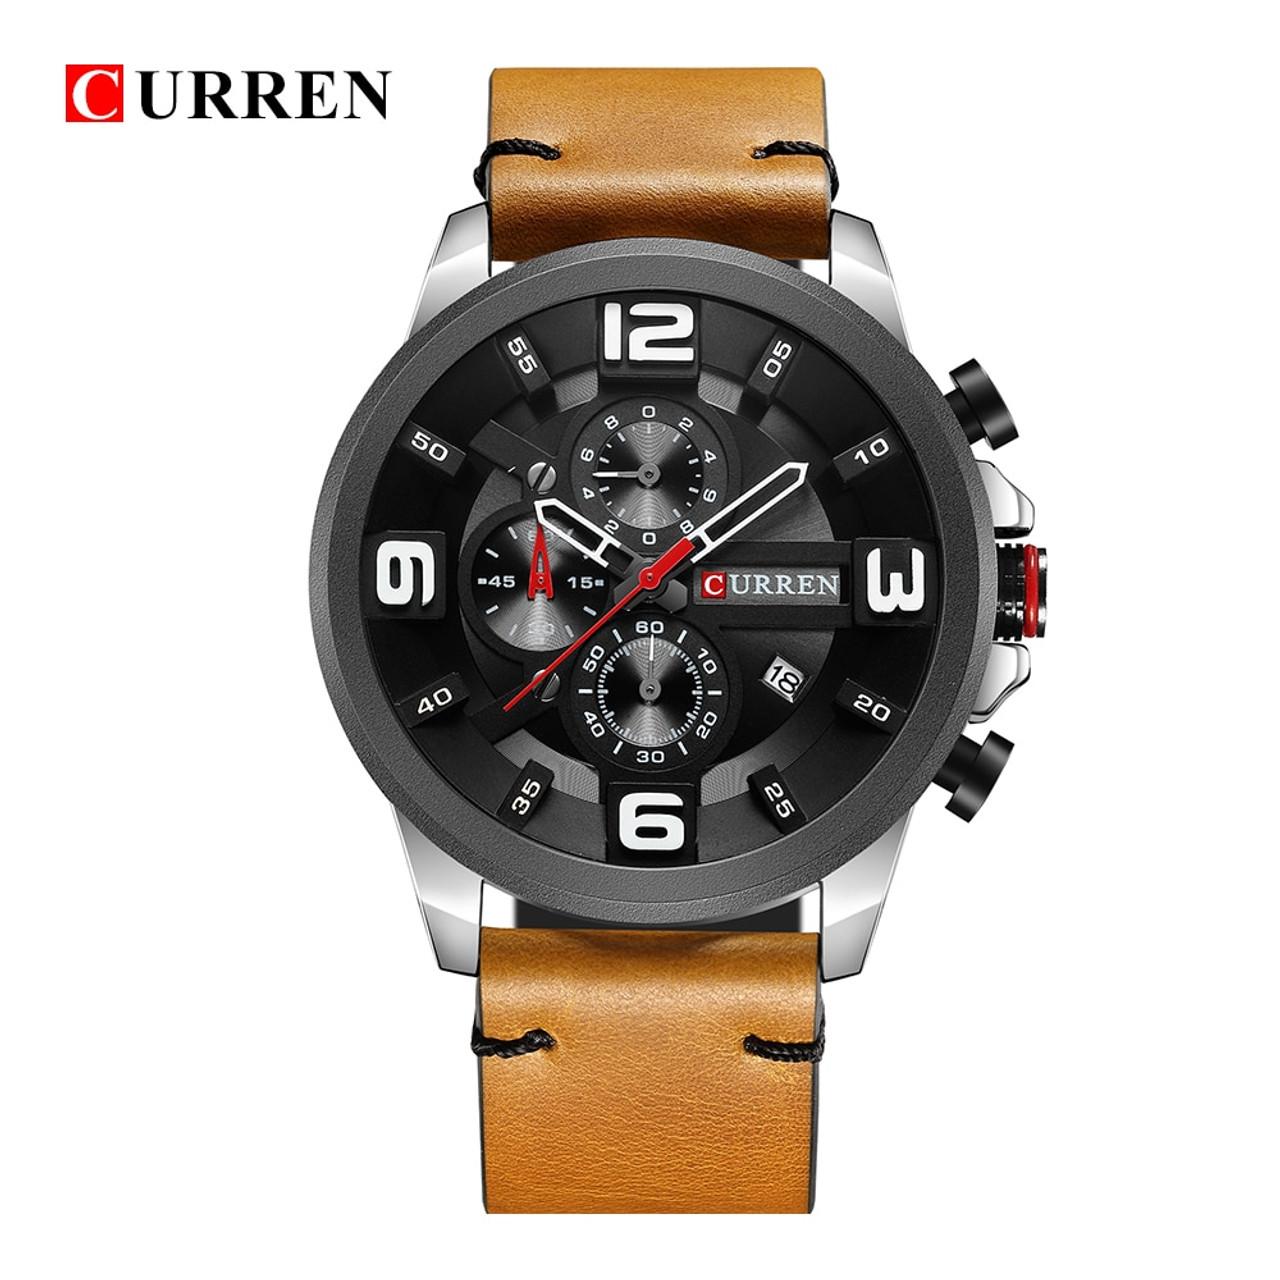 ... CURREN 8288 Top Luxury Brand Men Watches Men s Sports Quartz Clock Man  Leather Army Military Wristwatch ... c39c29b6e05